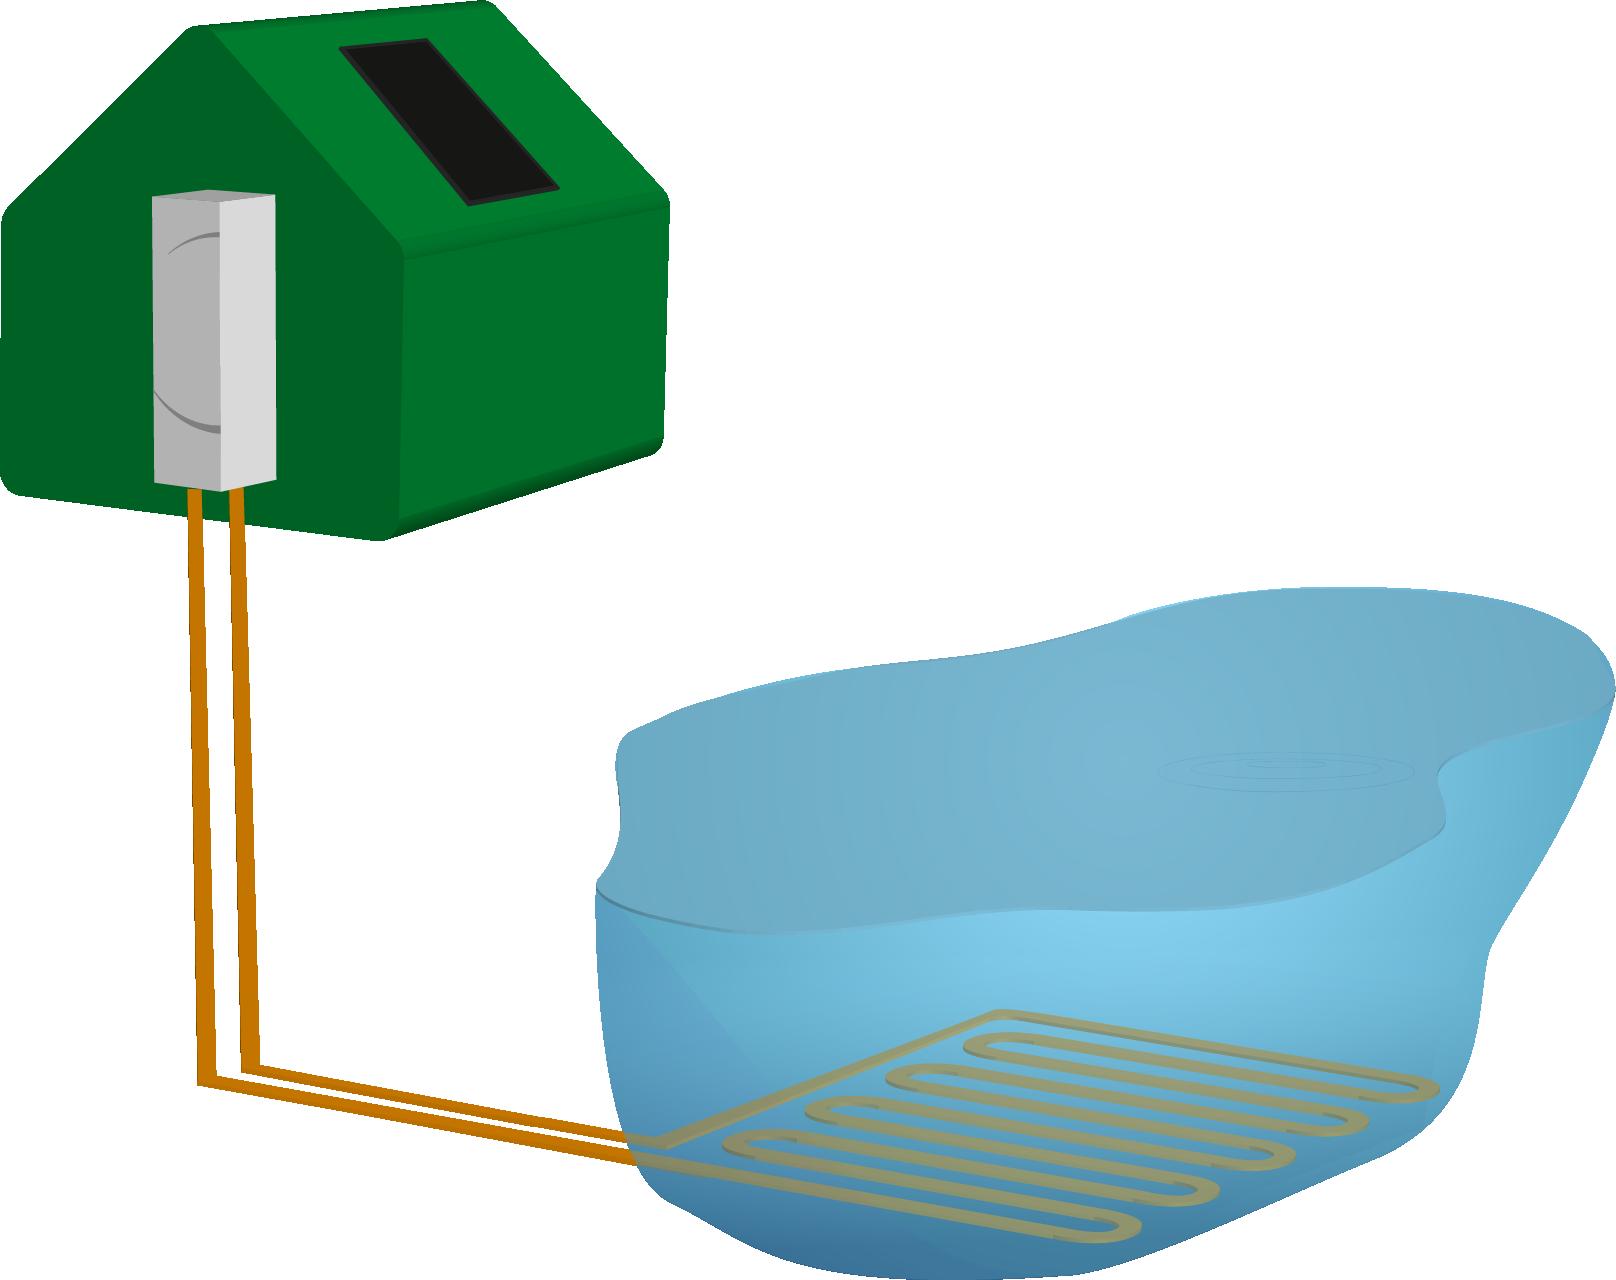 Pump free energy the. Heat clipart heat pressure